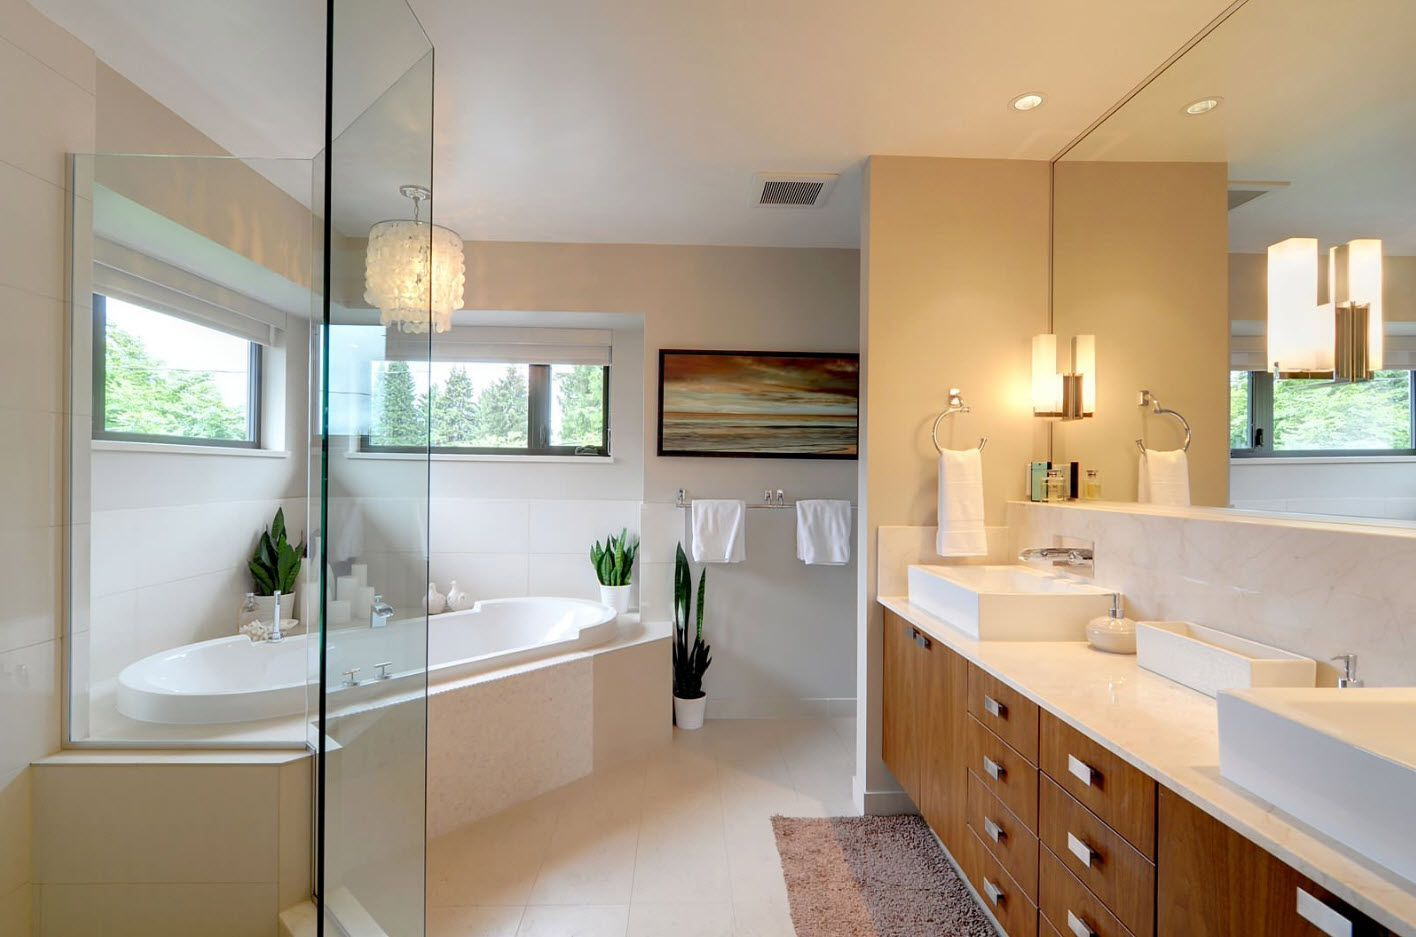 Bathroom Design Trends & Decoration Ideas 2017 with light wooden vanity